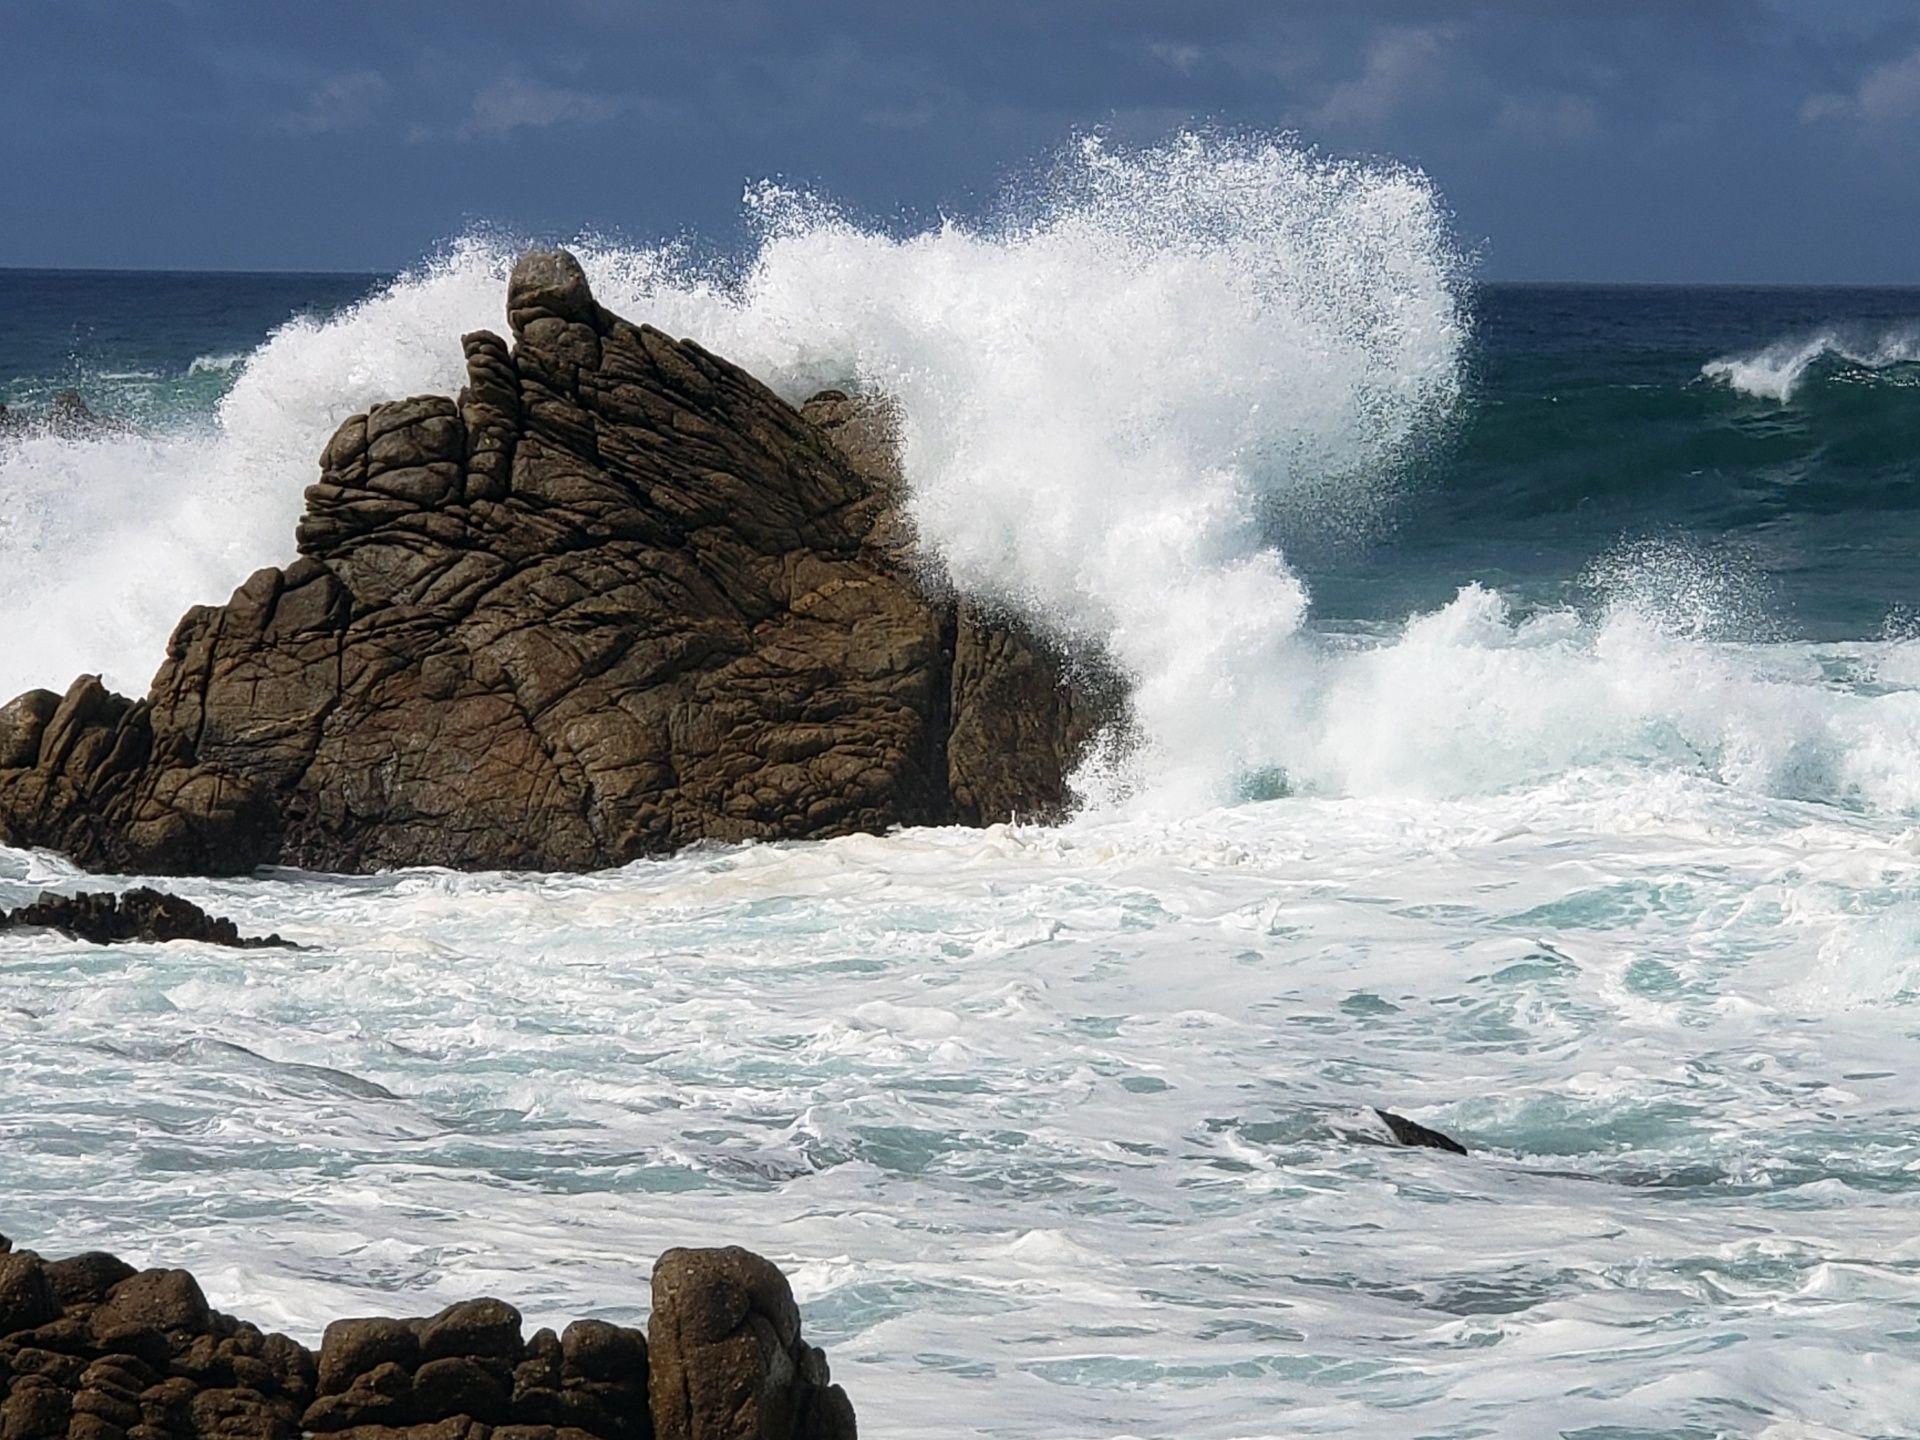 Contea Di Honolulu Hawaii wave breaking over rock free stock photo | beach photos